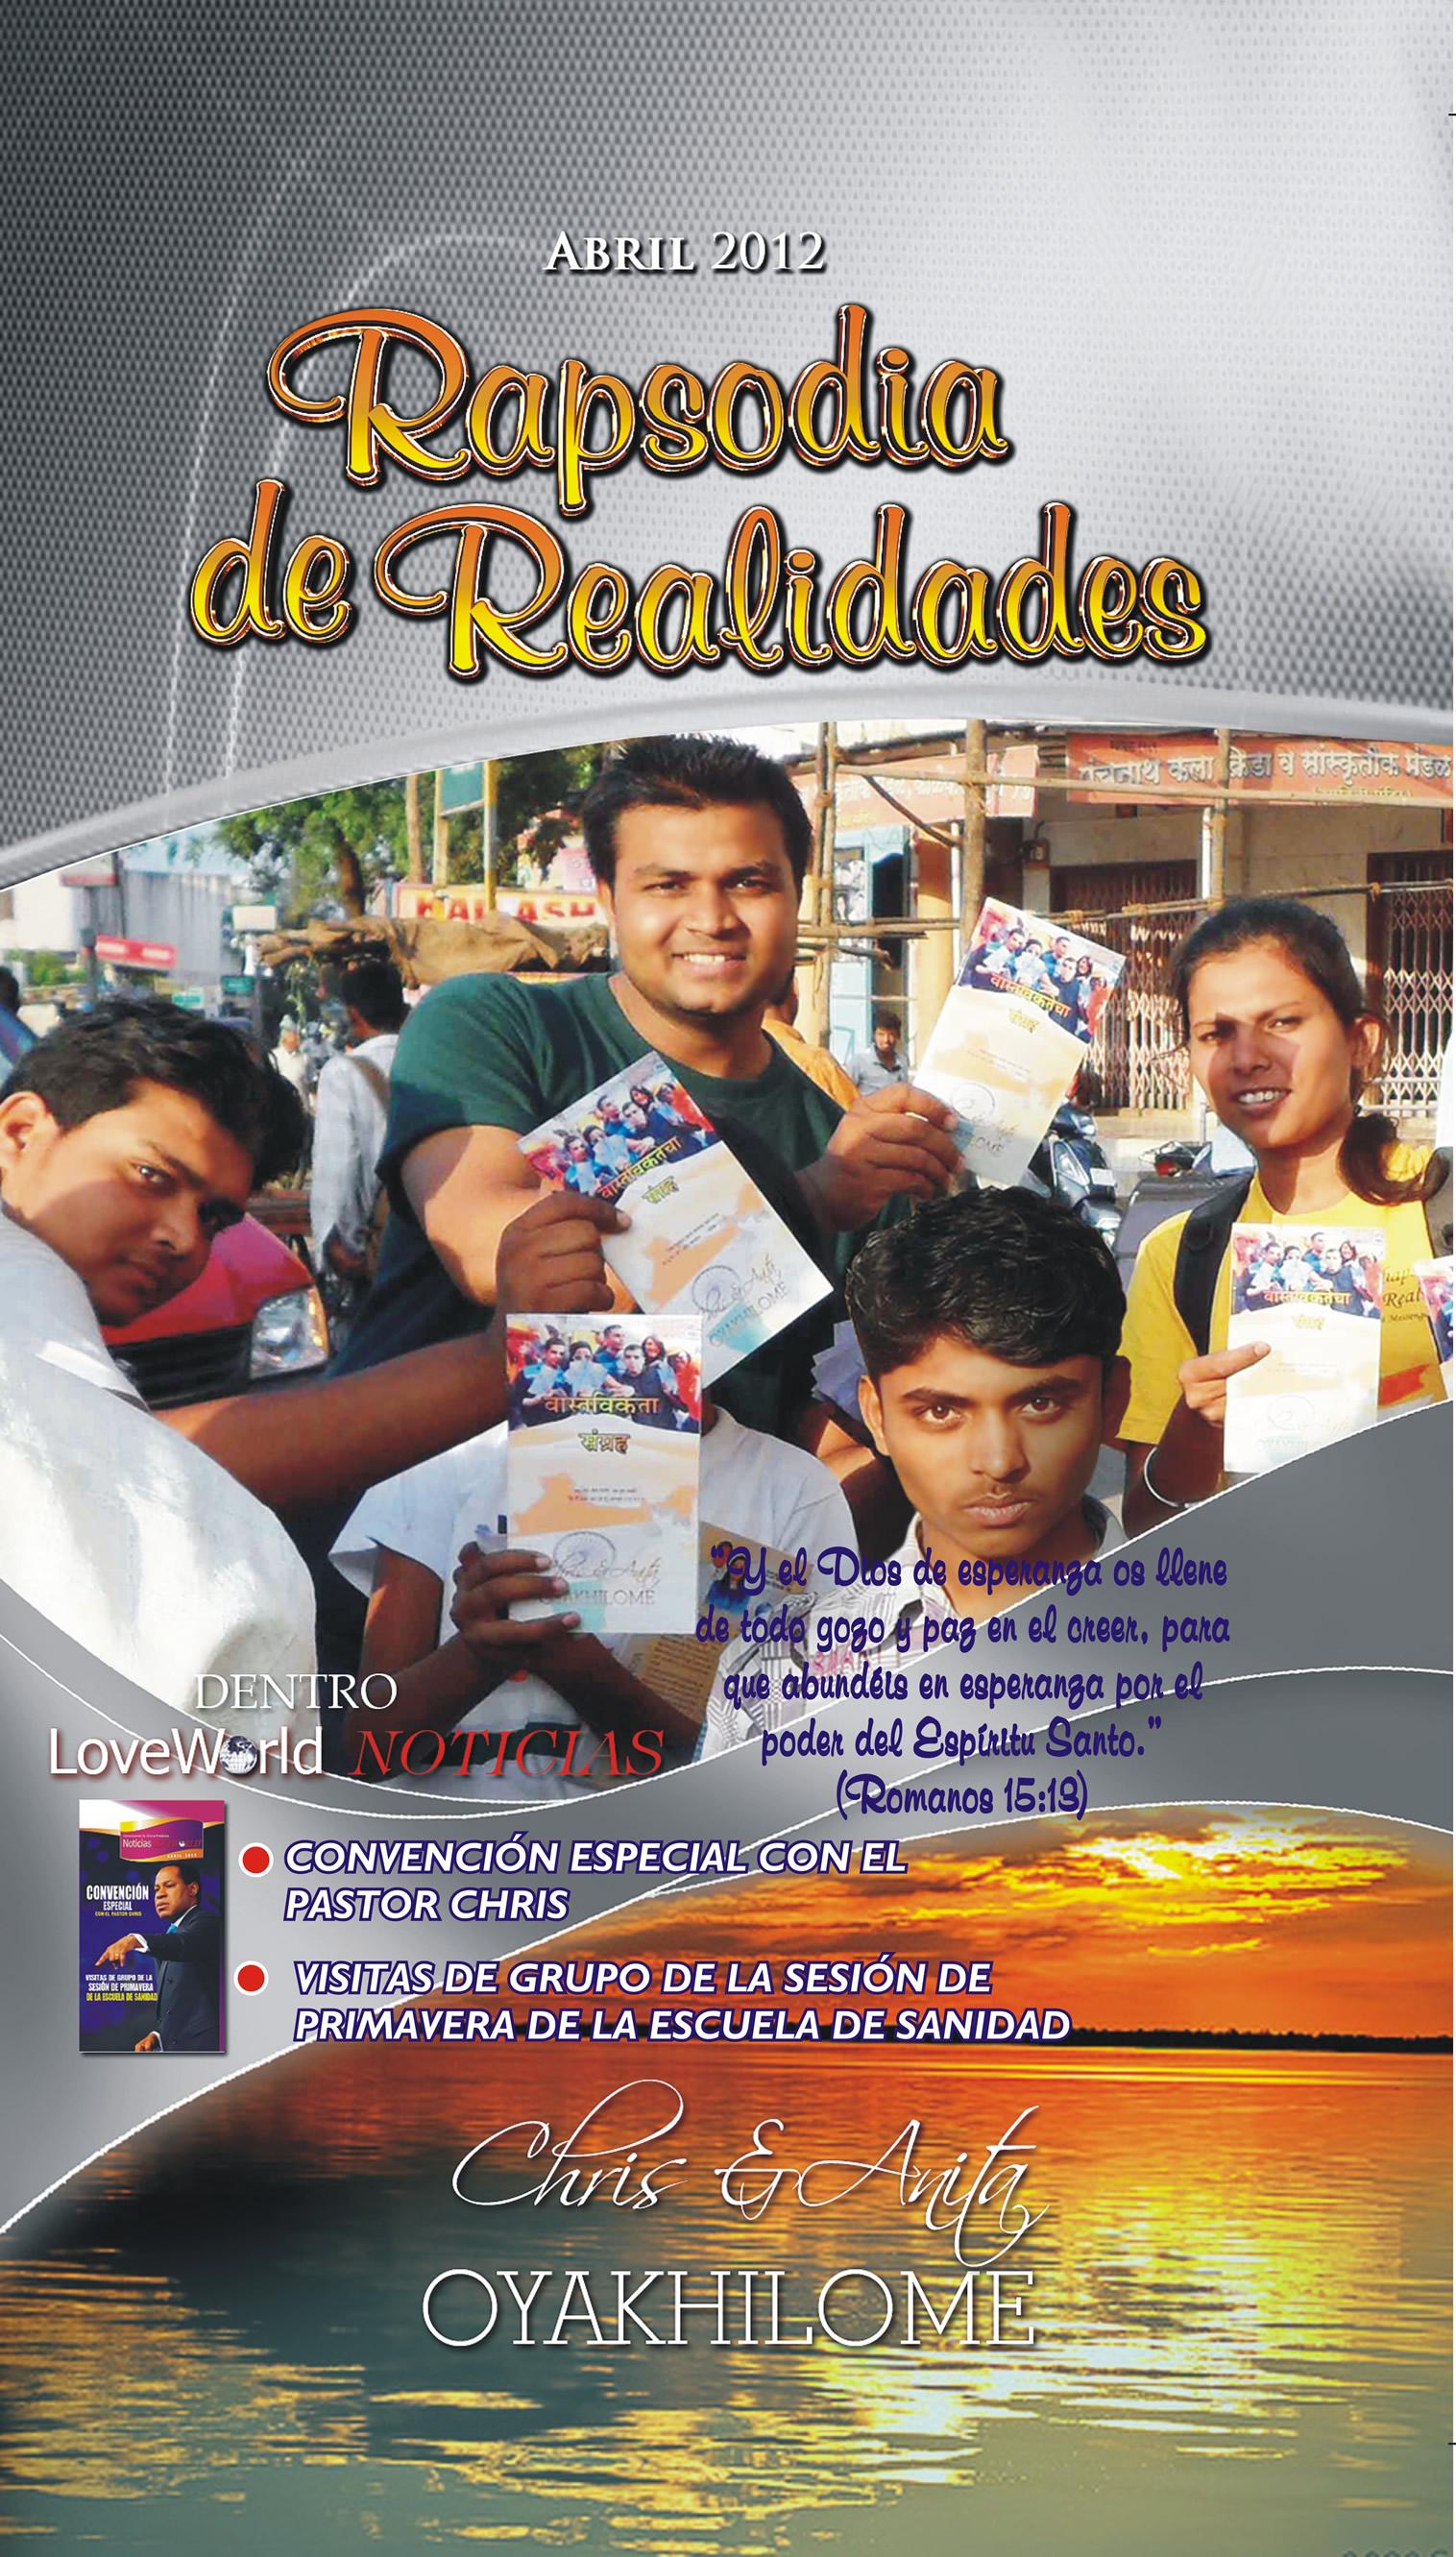 Pastor Chris and Anita Oyakhilome - Rhapsody of Realities April 2012 Spanish Edition